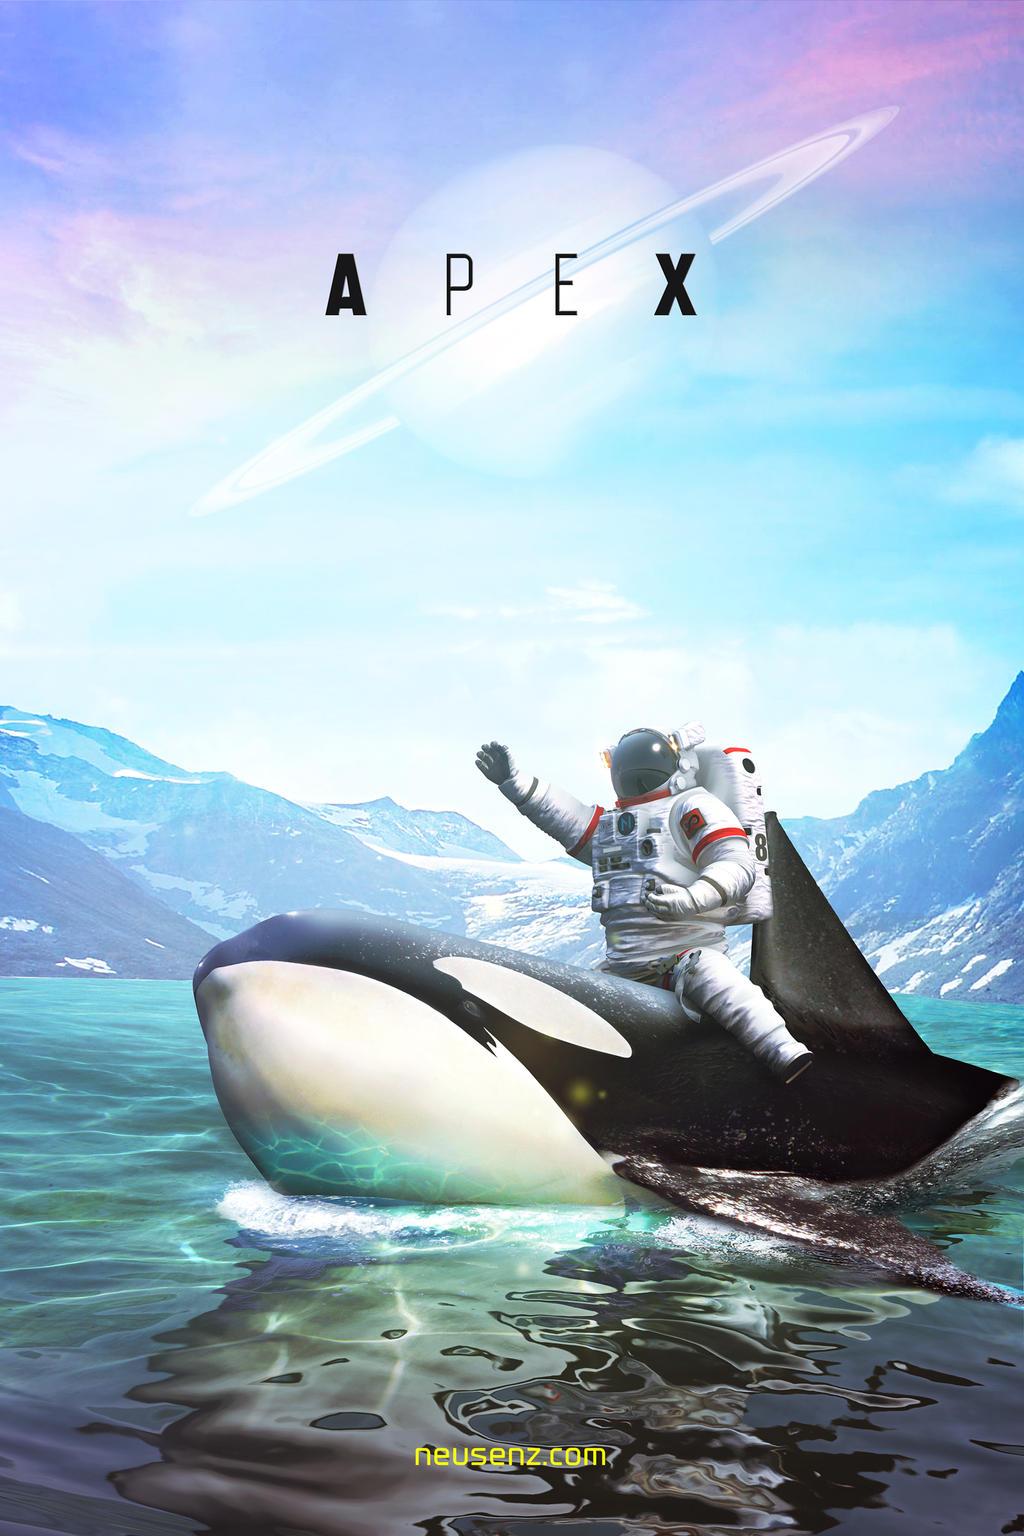 Apex by neutrix